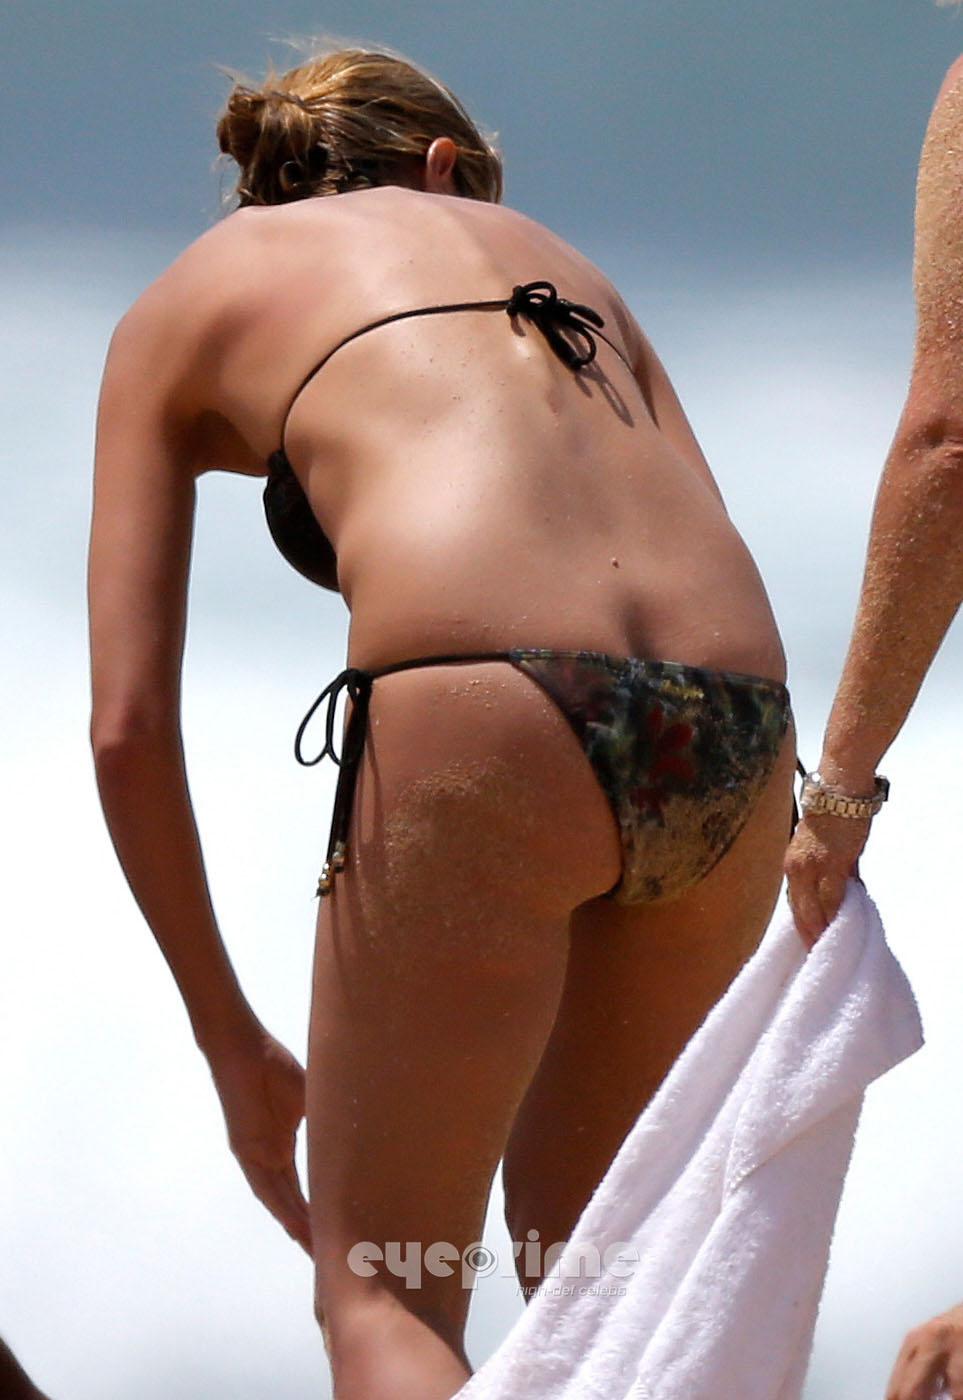 Heidi Klum Heidi Klum - Nipple Slip On The Beach In -4142